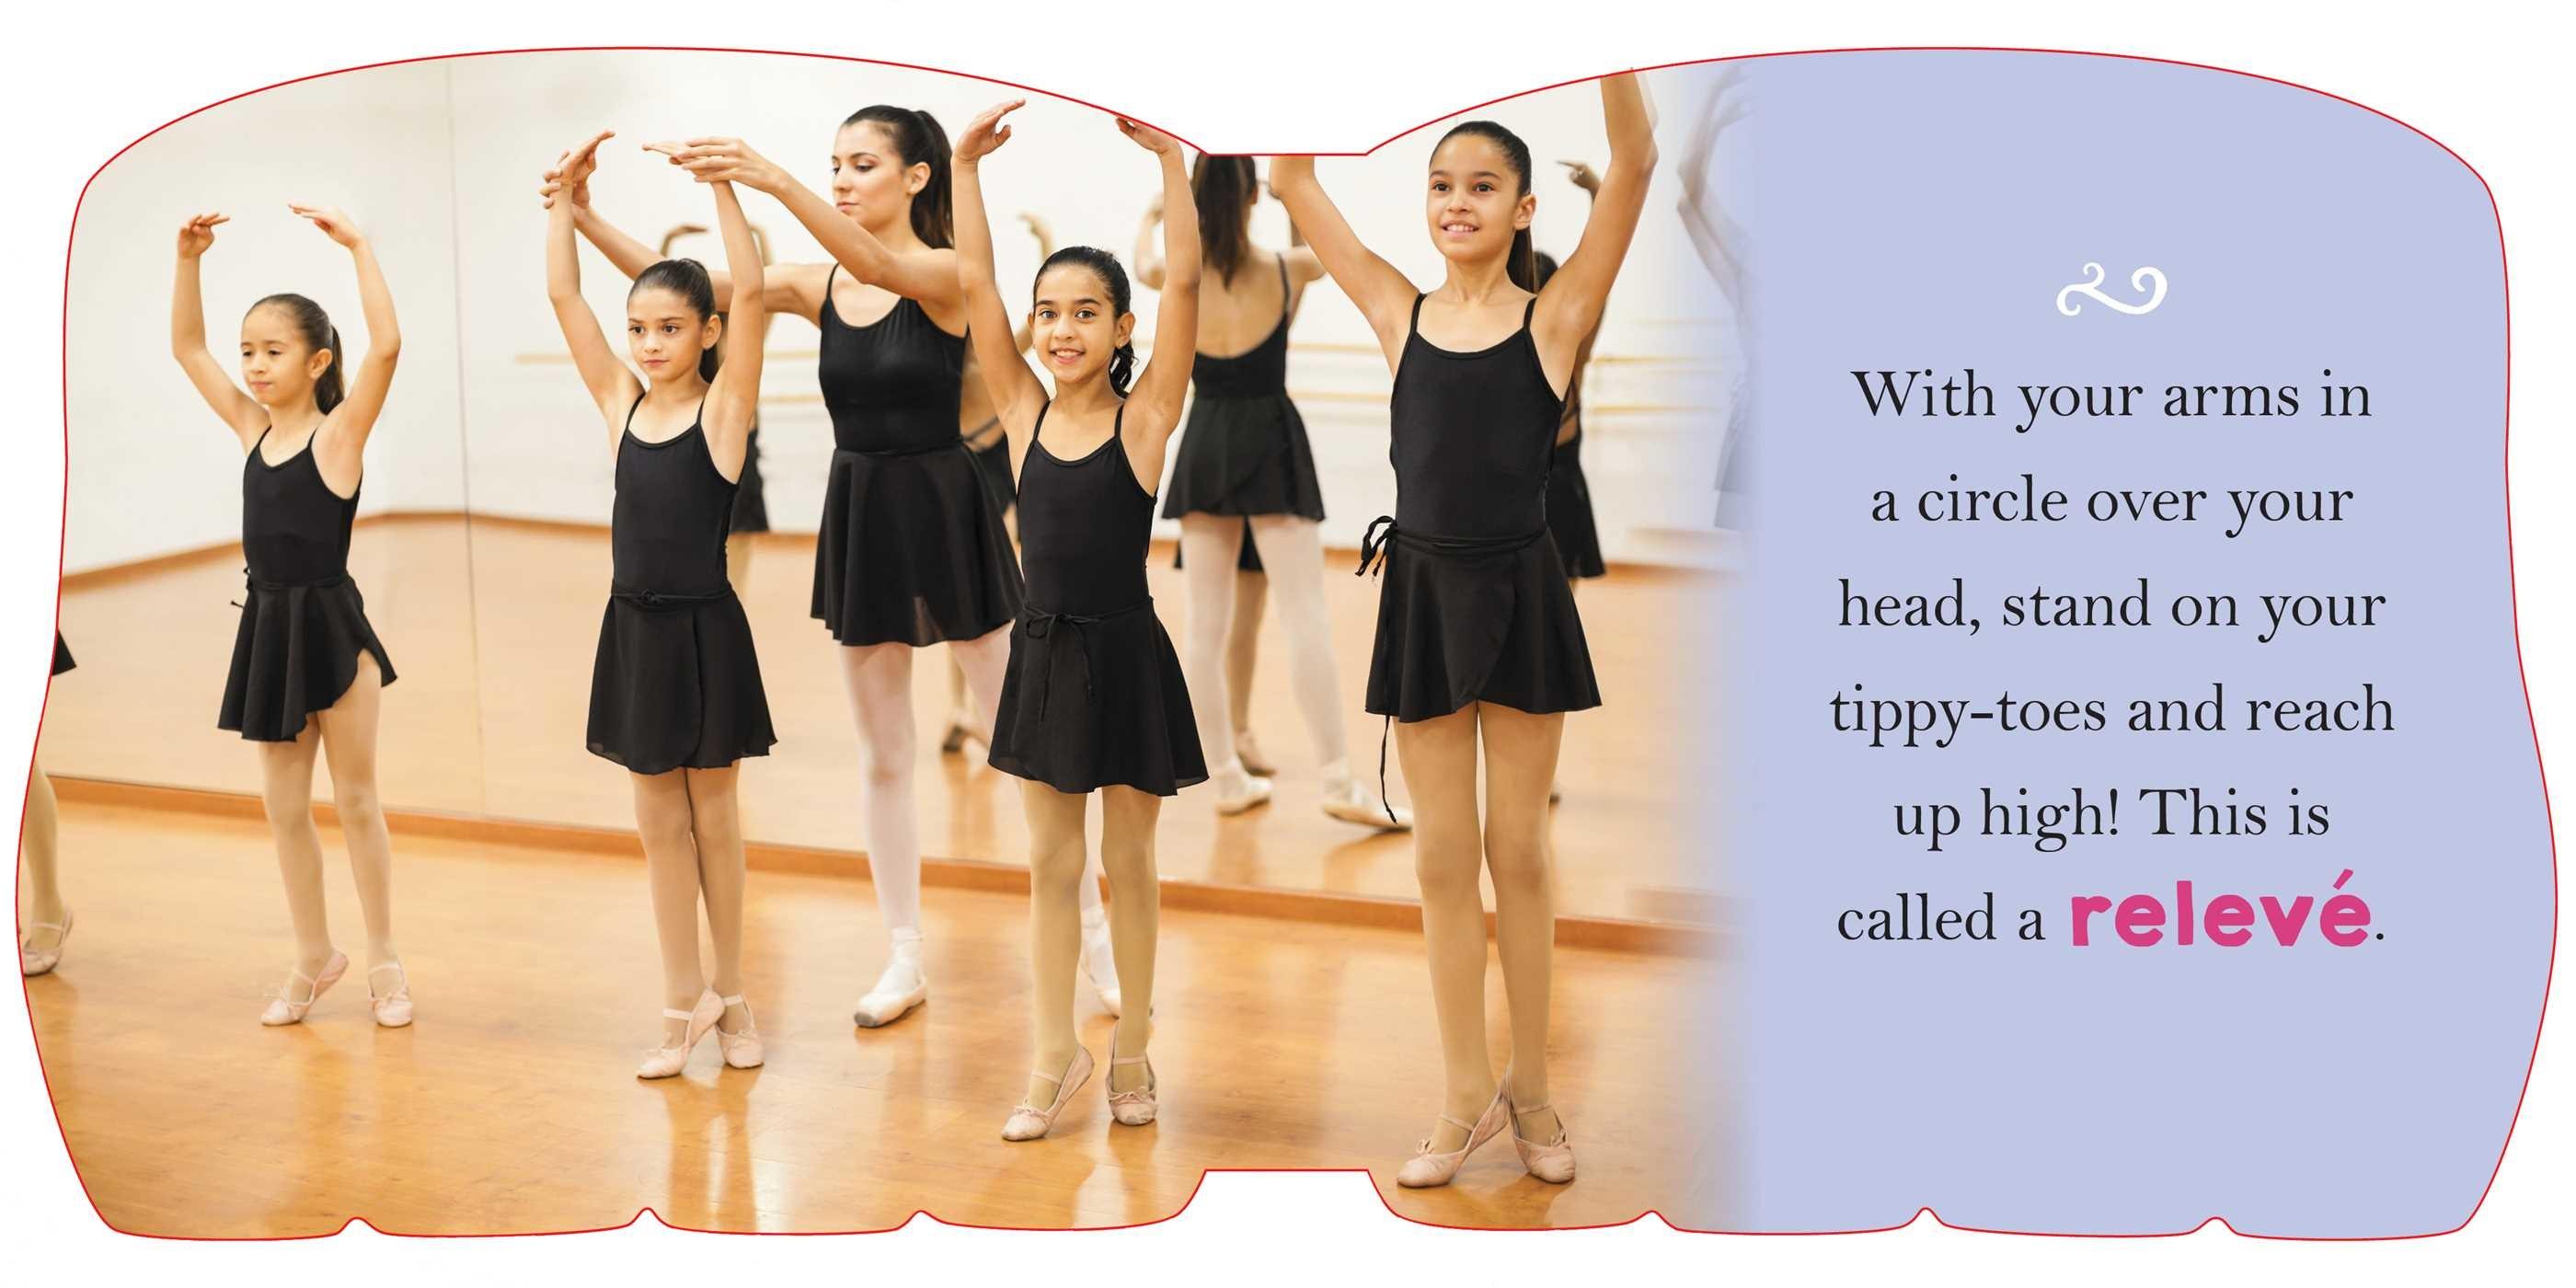 Ballet slippers 9781534422162.in03